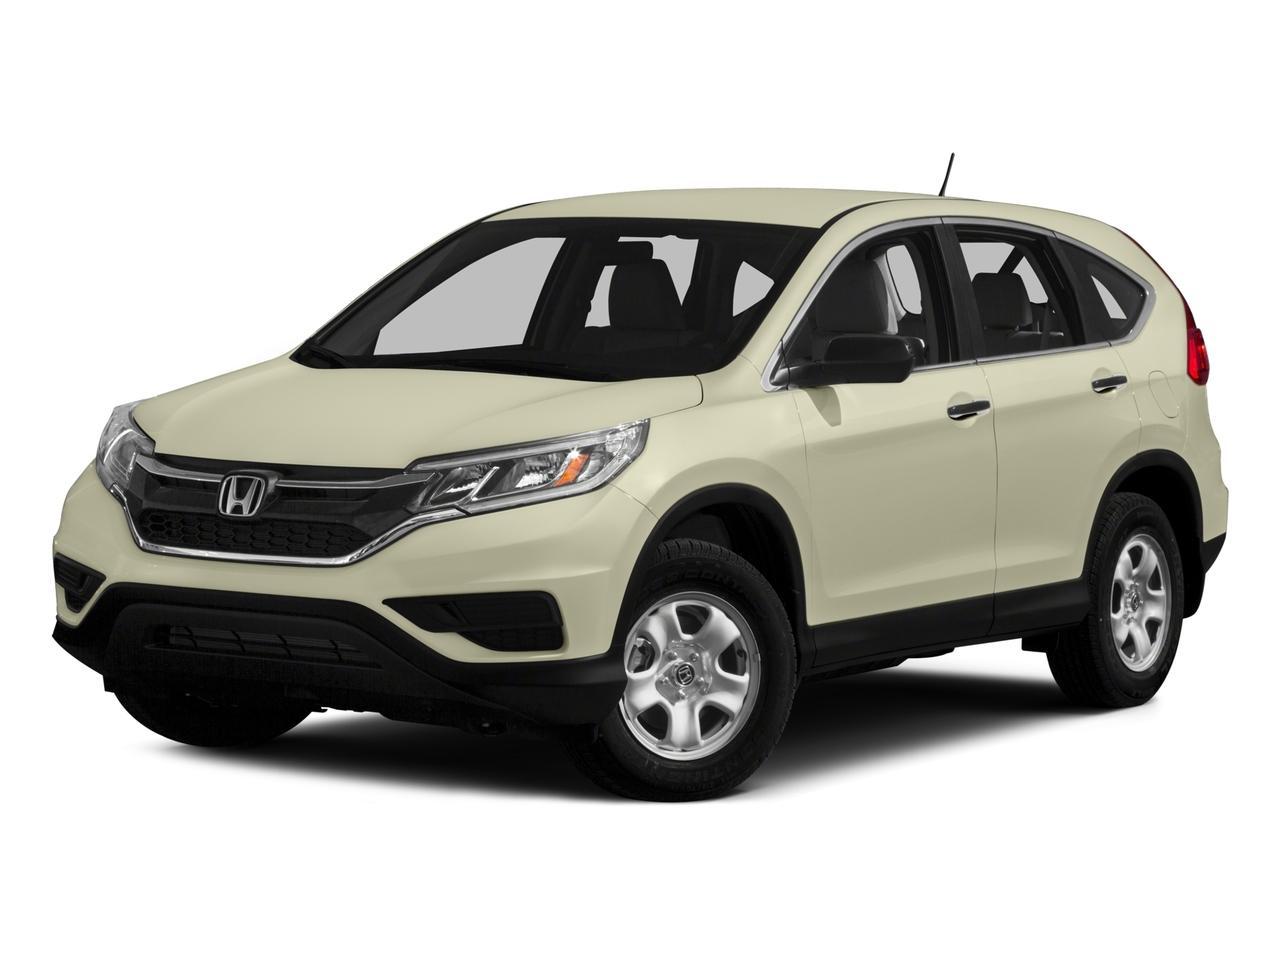 2015 Honda CR-V Vehicle Photo in Pittsburg, CA 94565